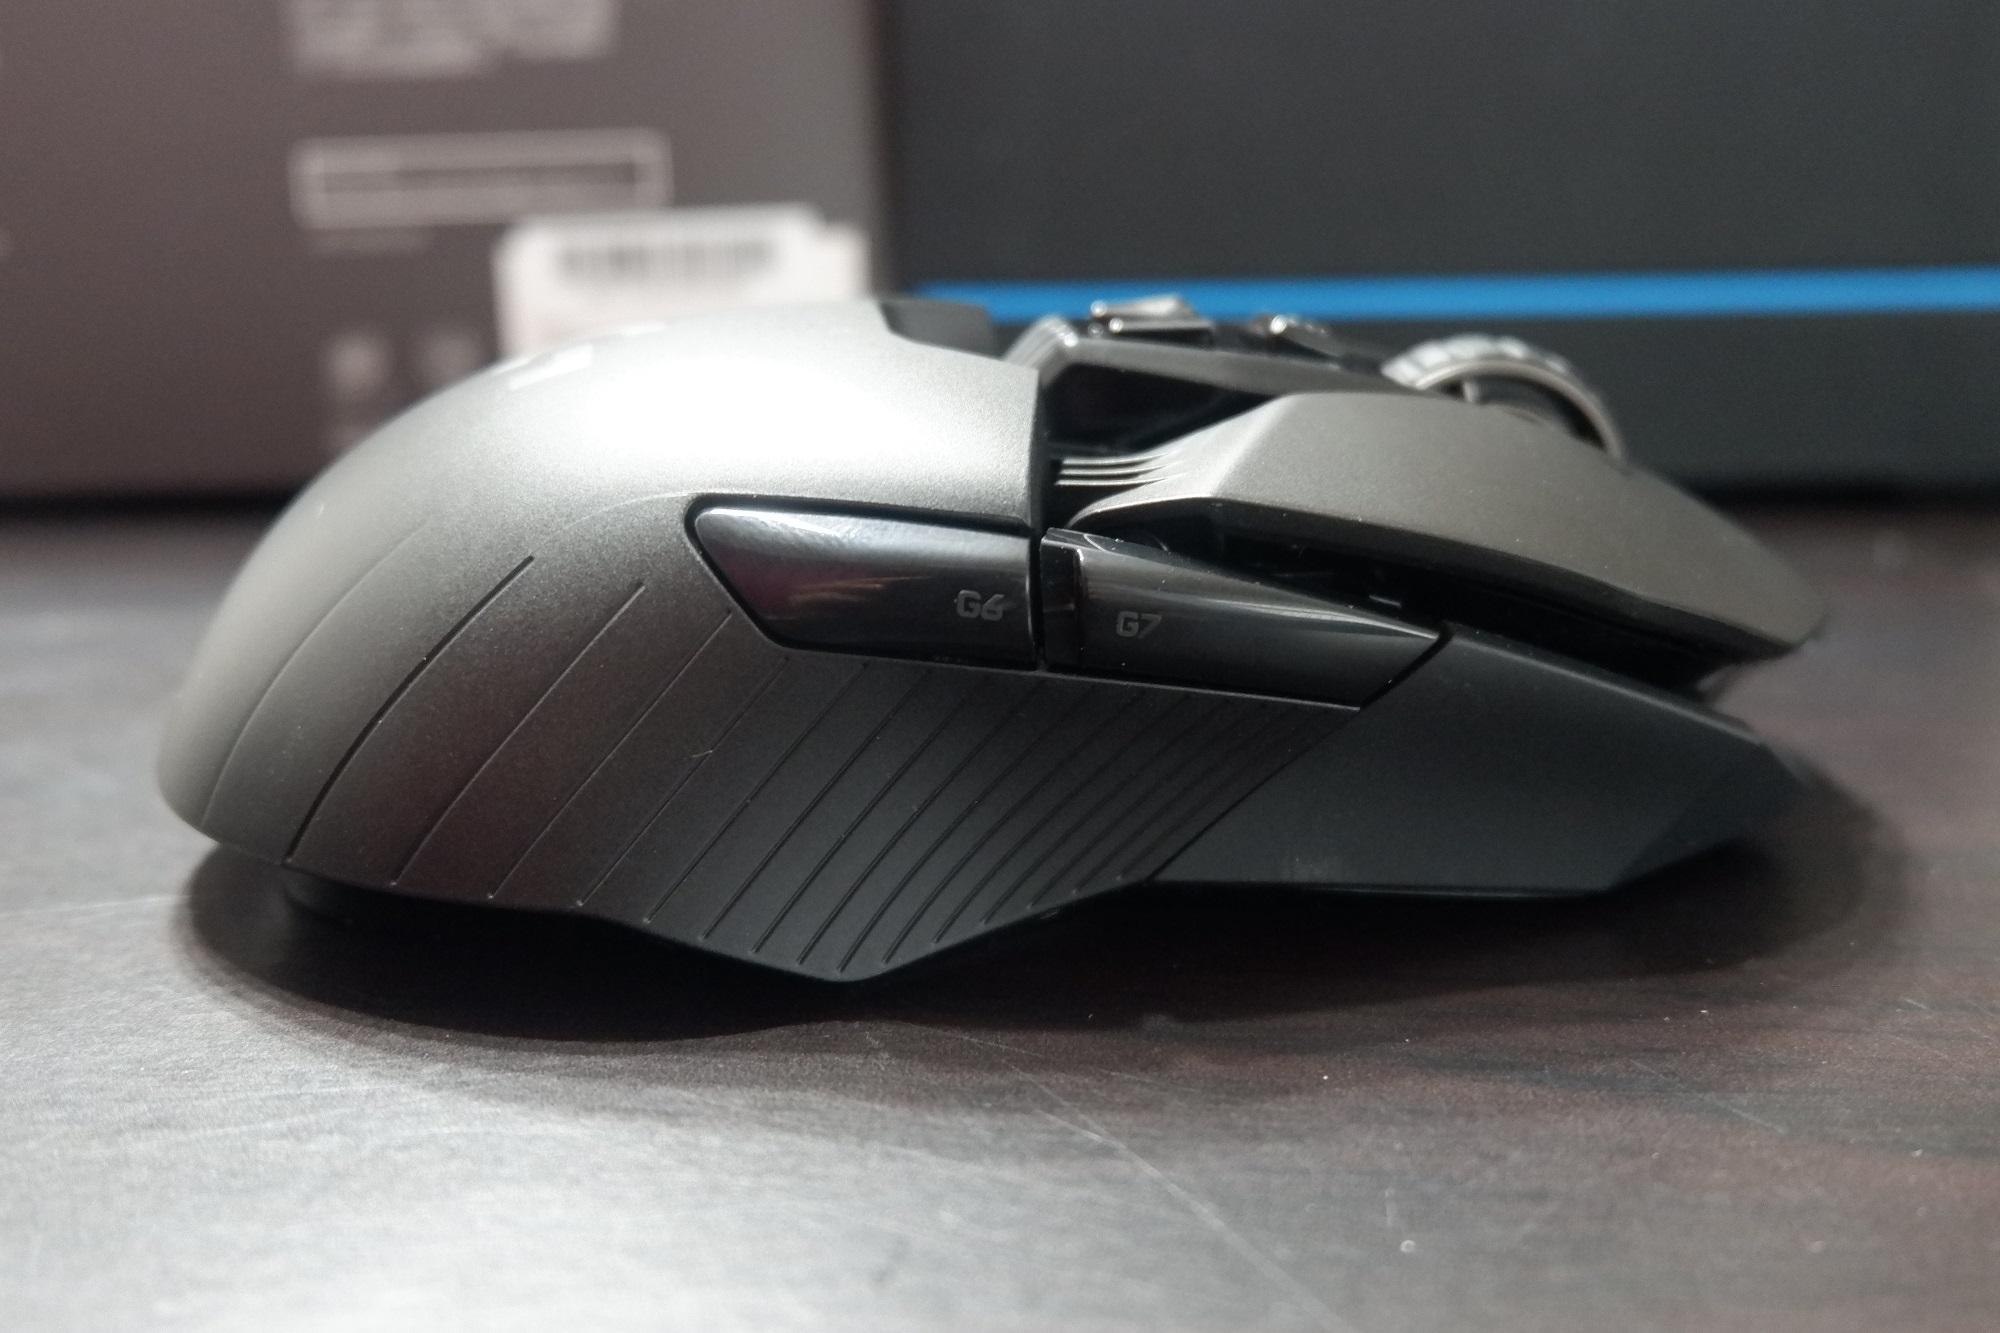 G903 - 右側面部品取り付け後